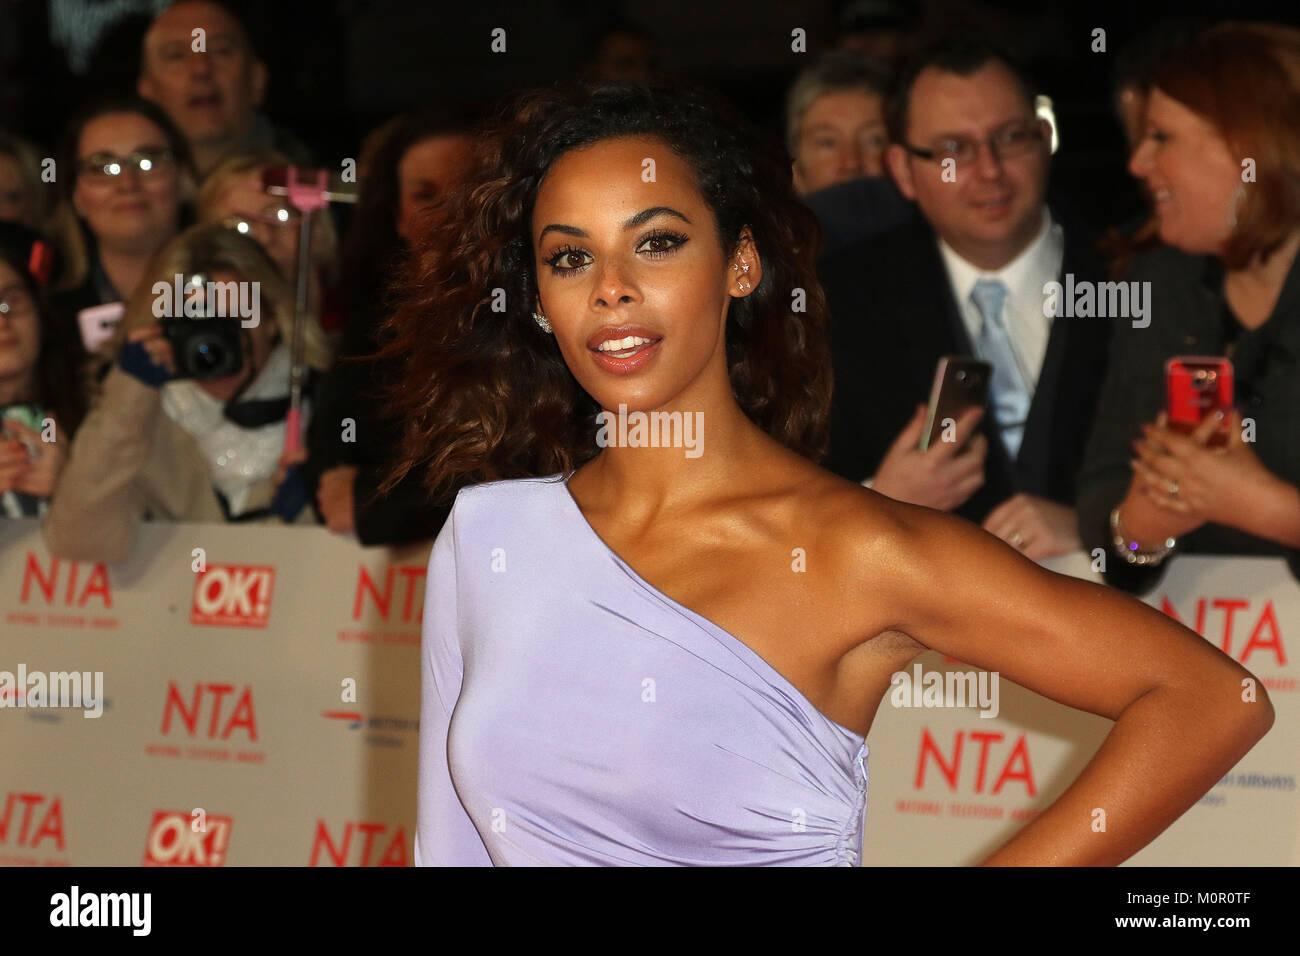 London, UK. 23rd January, 2018. Rochelle Humes, National Television Awards, The O2 London, UK. 23rd Jan, 2018. Photo - Stock Image